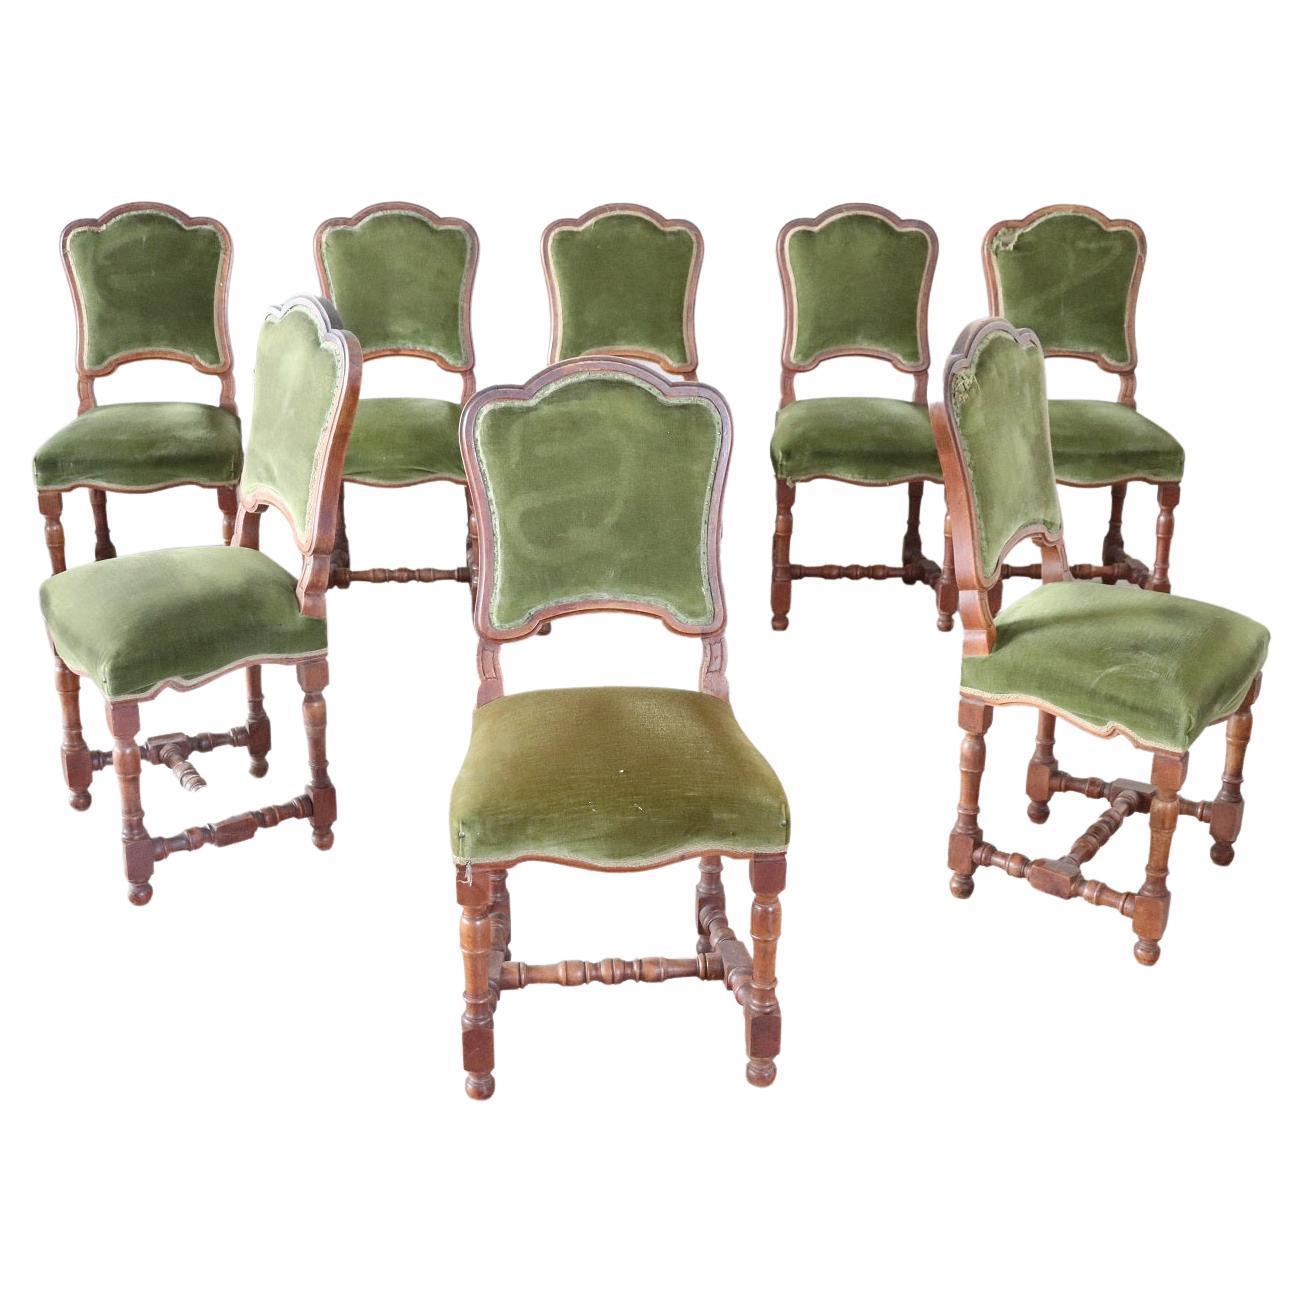 19th Century Italian Walnut Antique Dining Room Chairs, Set of Eight